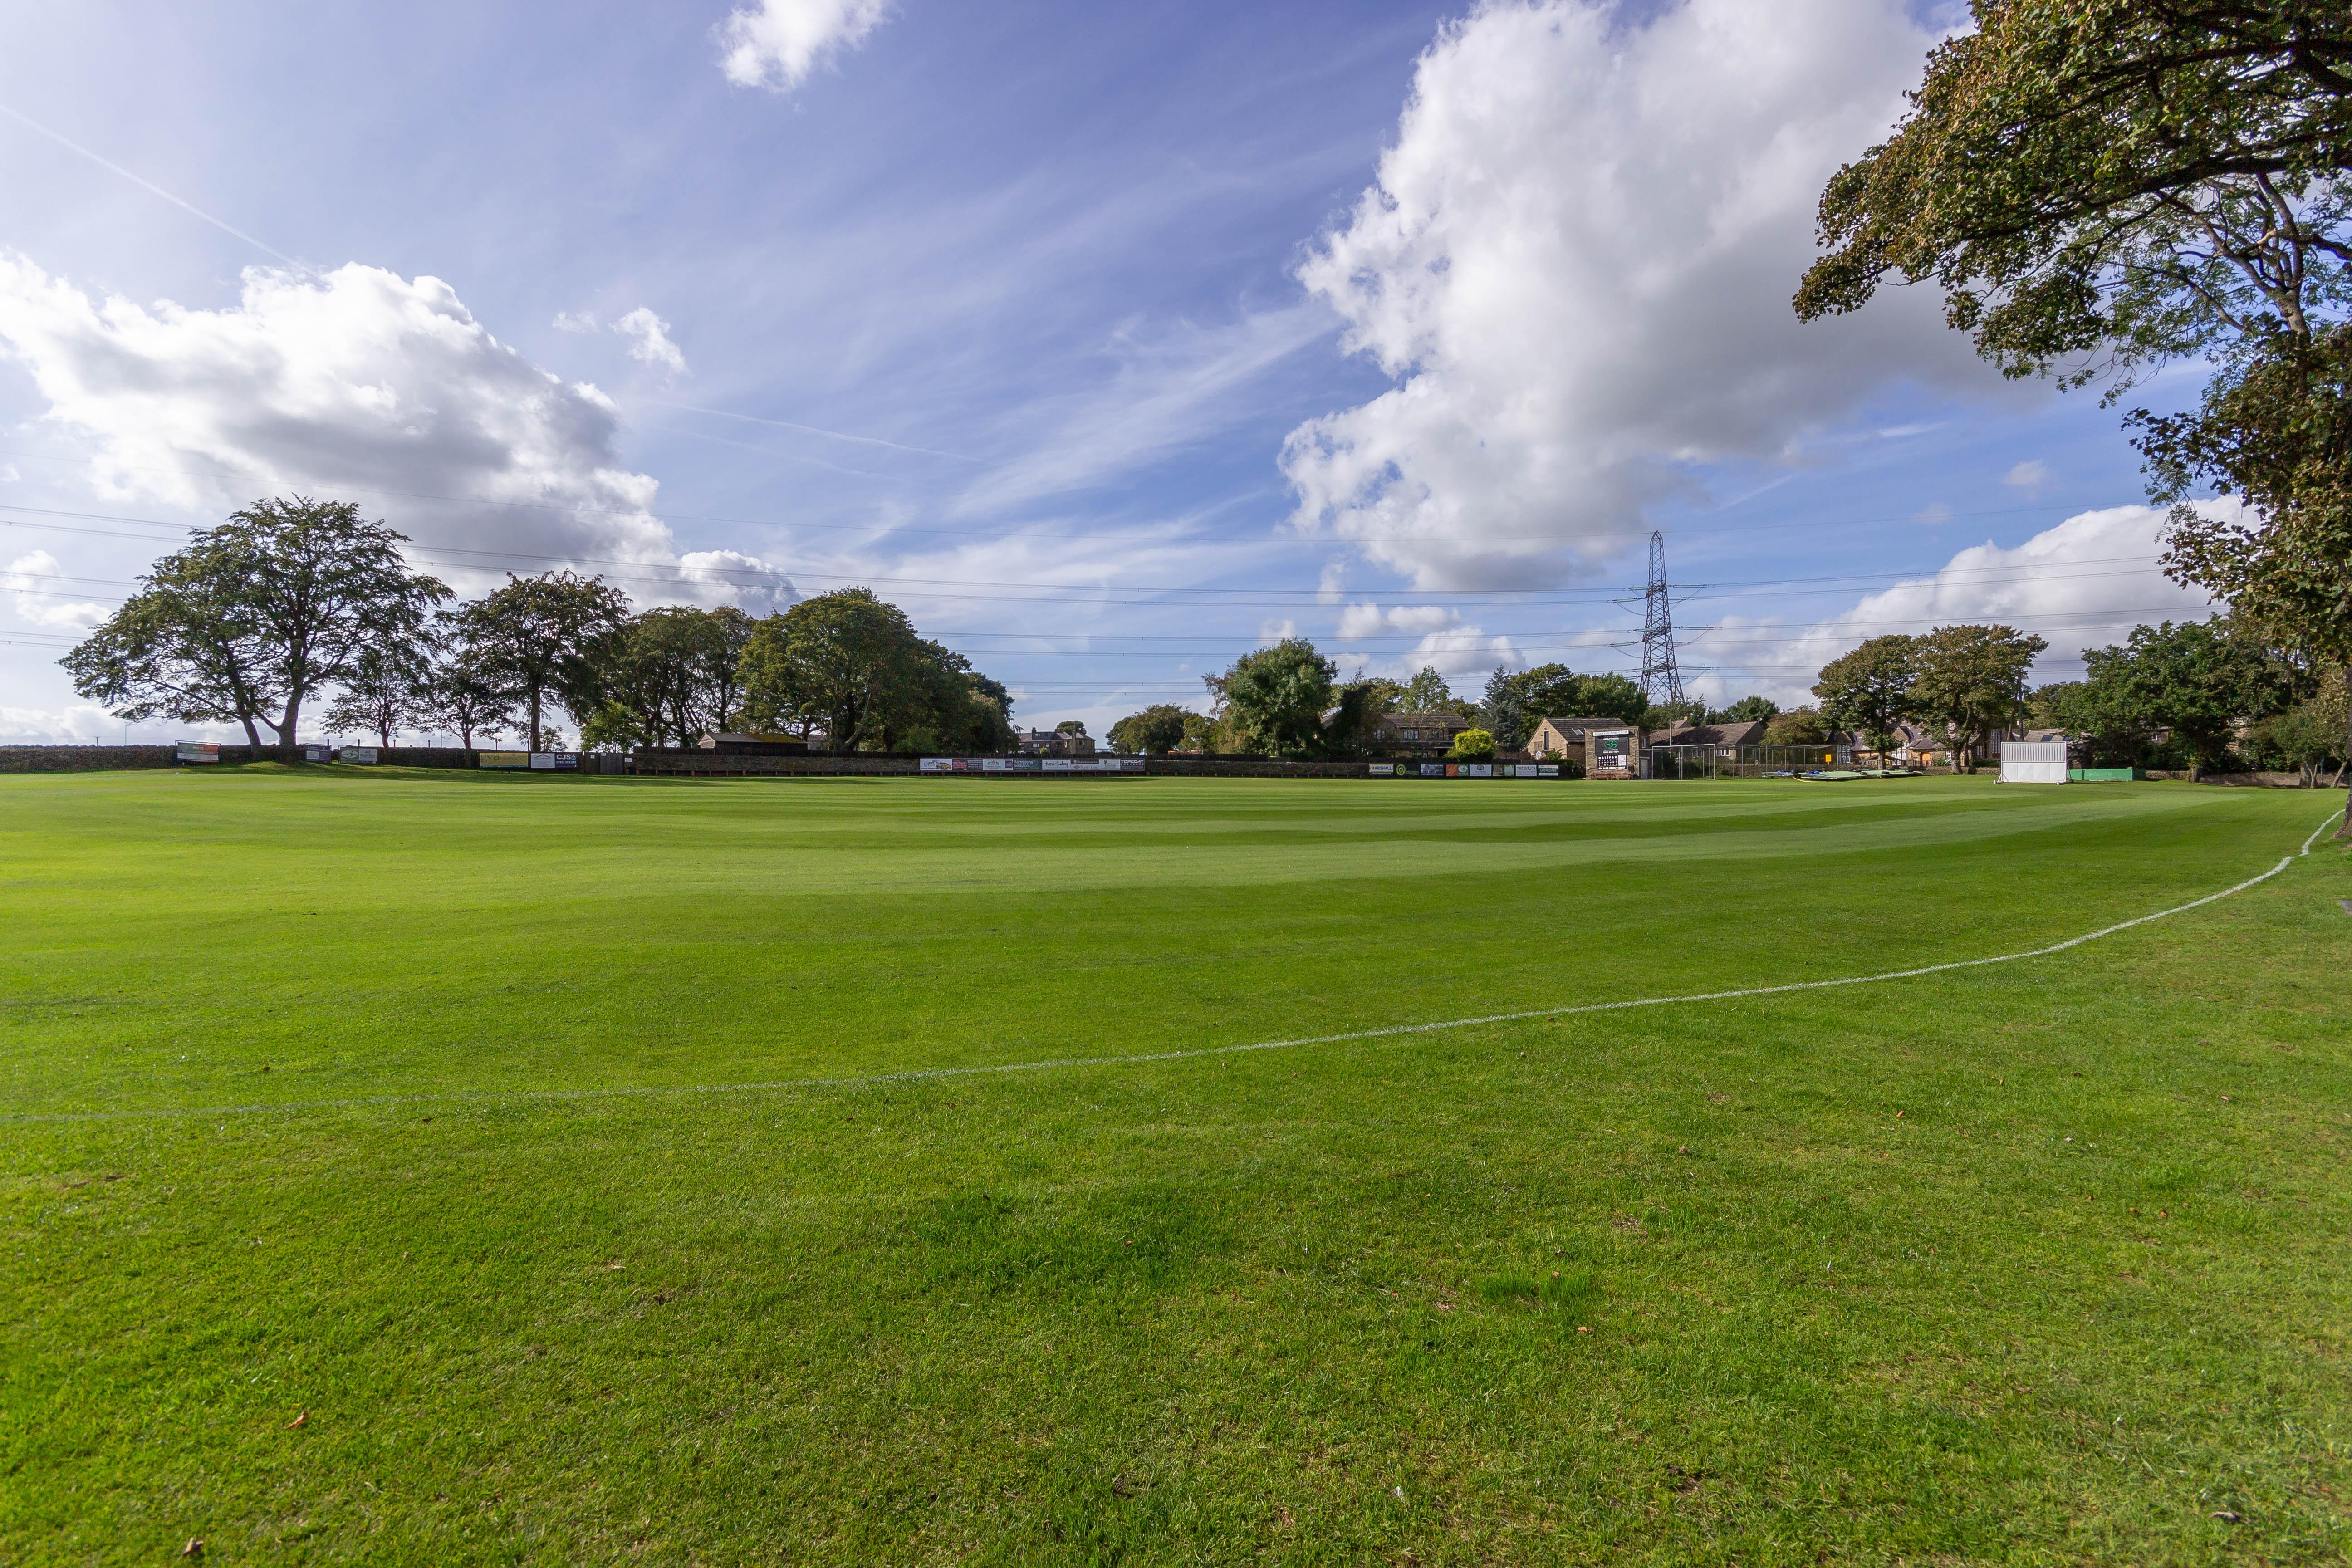 barkisland_cricket_club-1